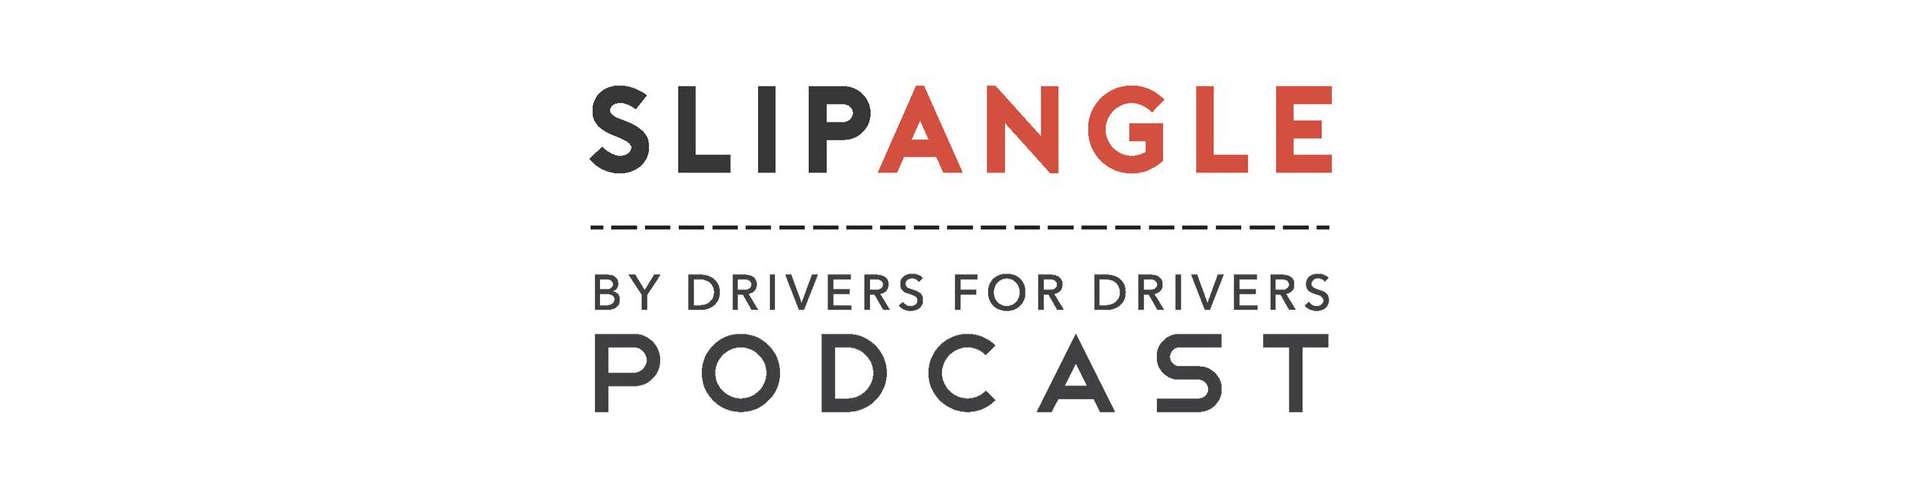 03_SlipAngle Show Podcast